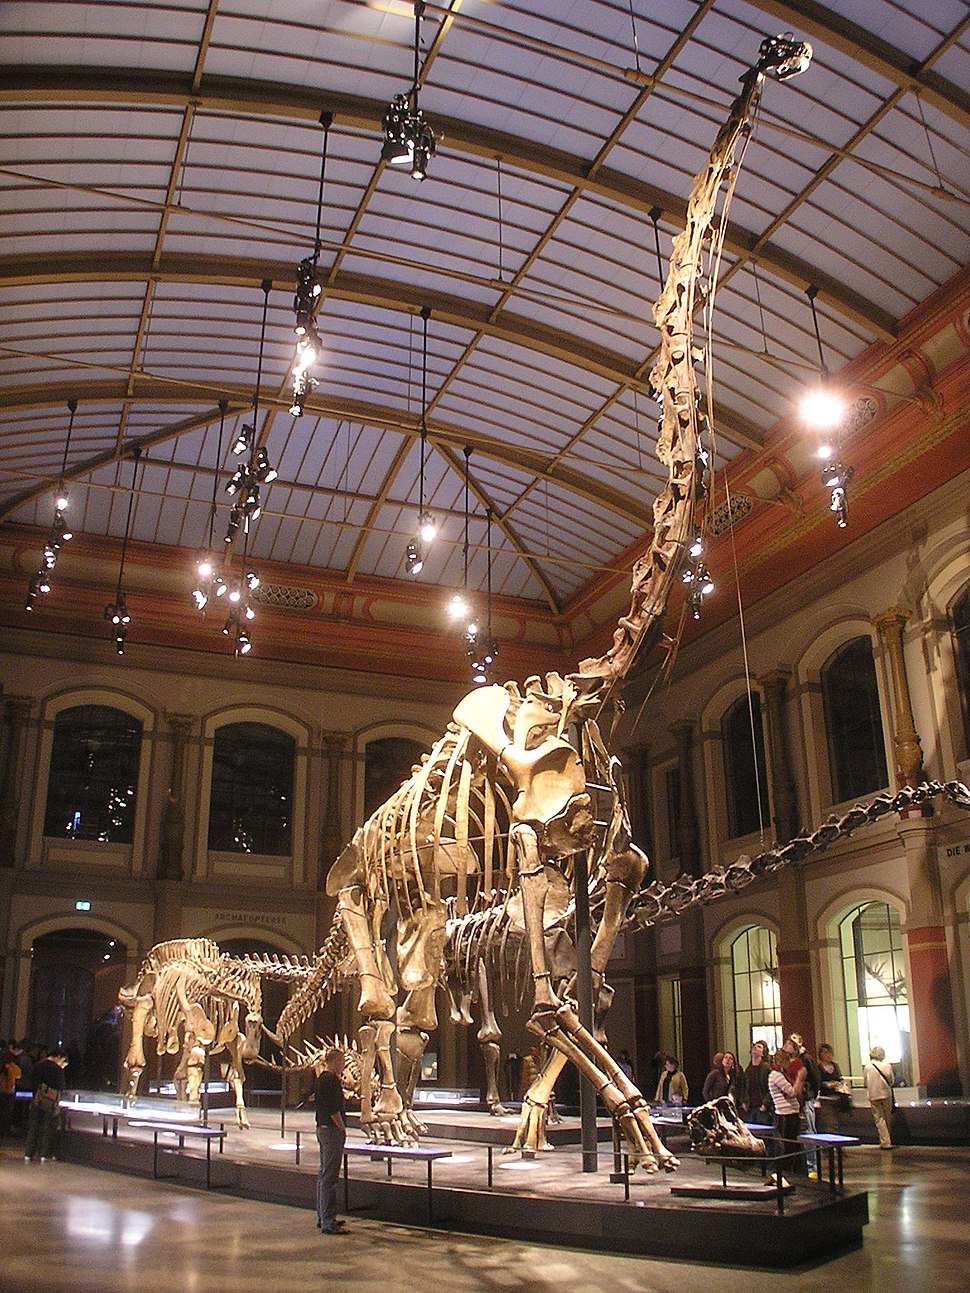 Giraffatitan brancai Naturkundemuseum Berlin